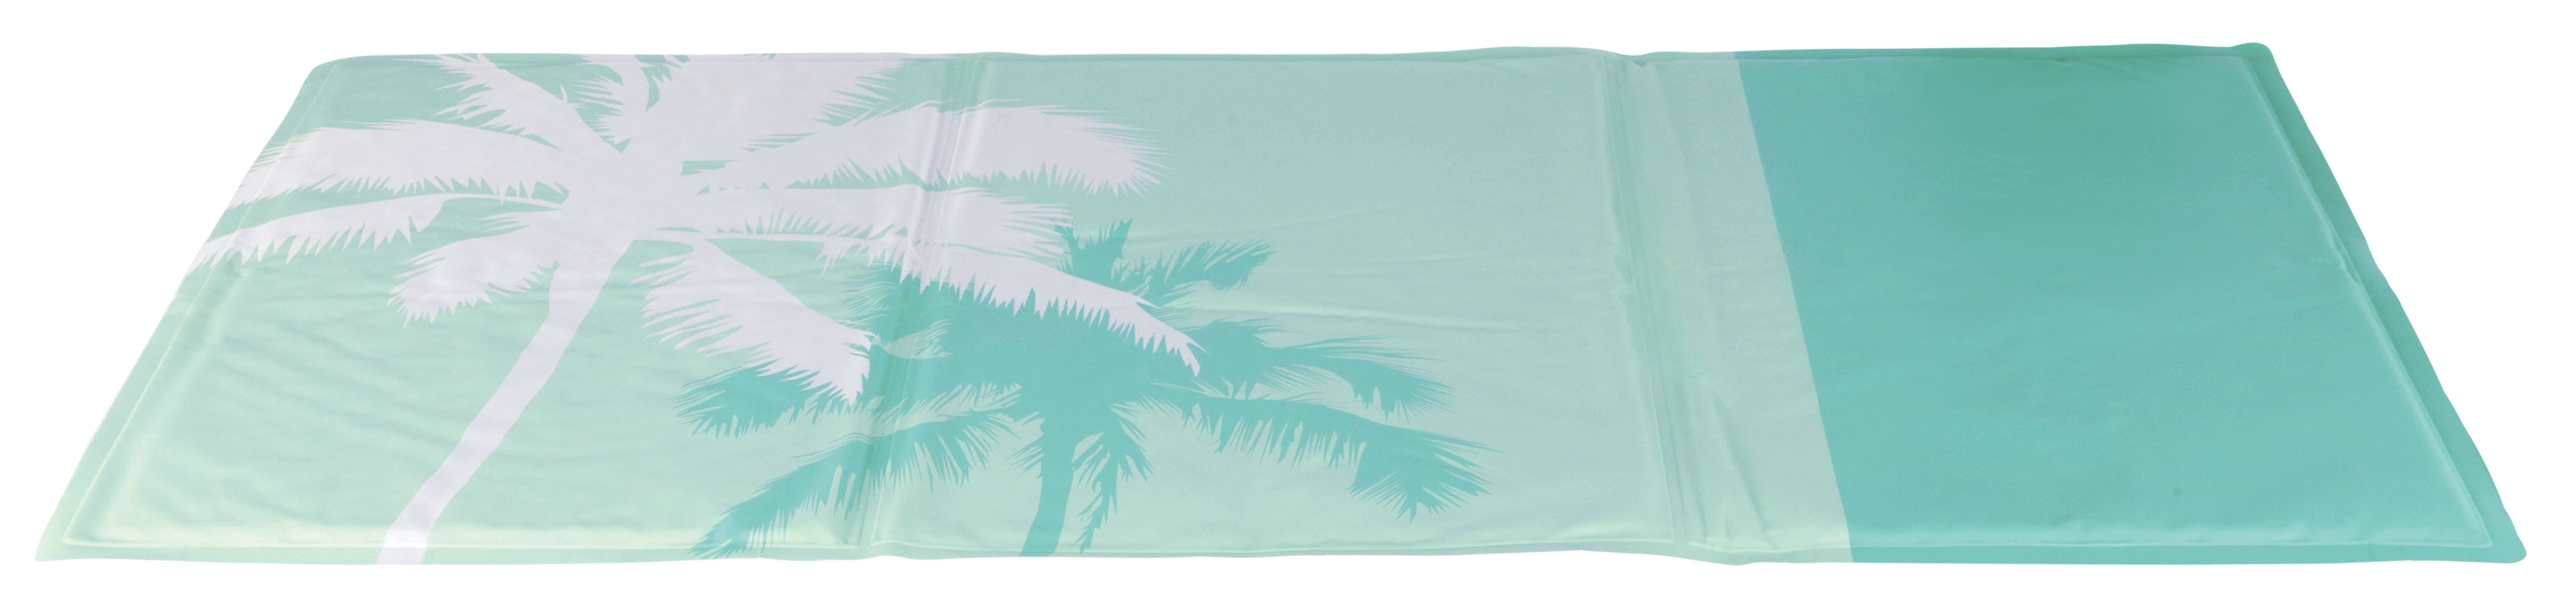 Trixie Cooling Mat 90 x 50 - MINT